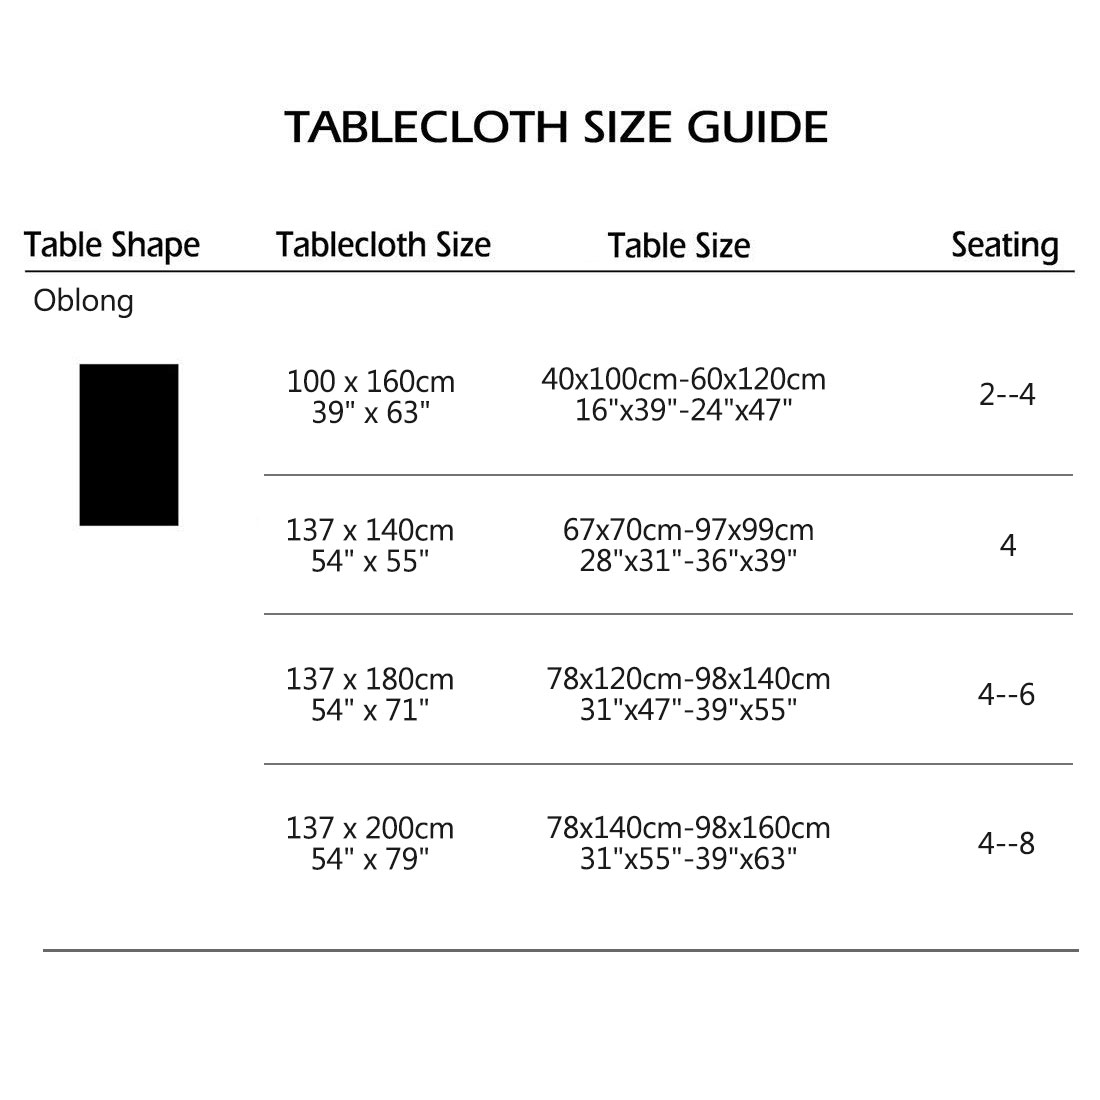 "Tablecloth PVC Vinyl Table Cover Oil Water Resistant Table Cloth 54"" x 79"", #4 - image 6 de 7"